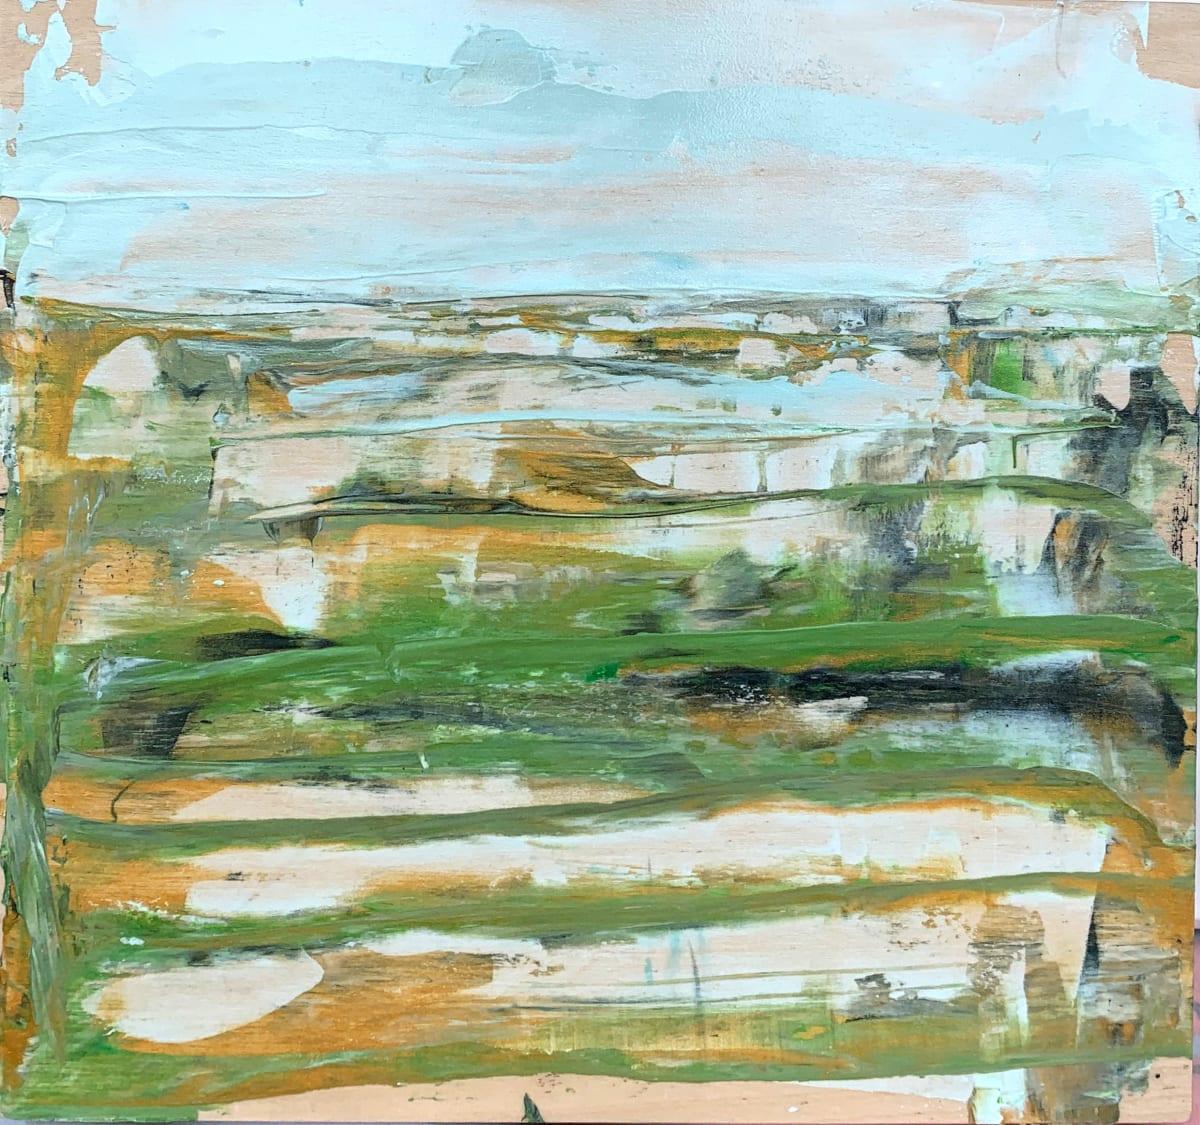 Brackish Waters 2 by Haidee DeRouen